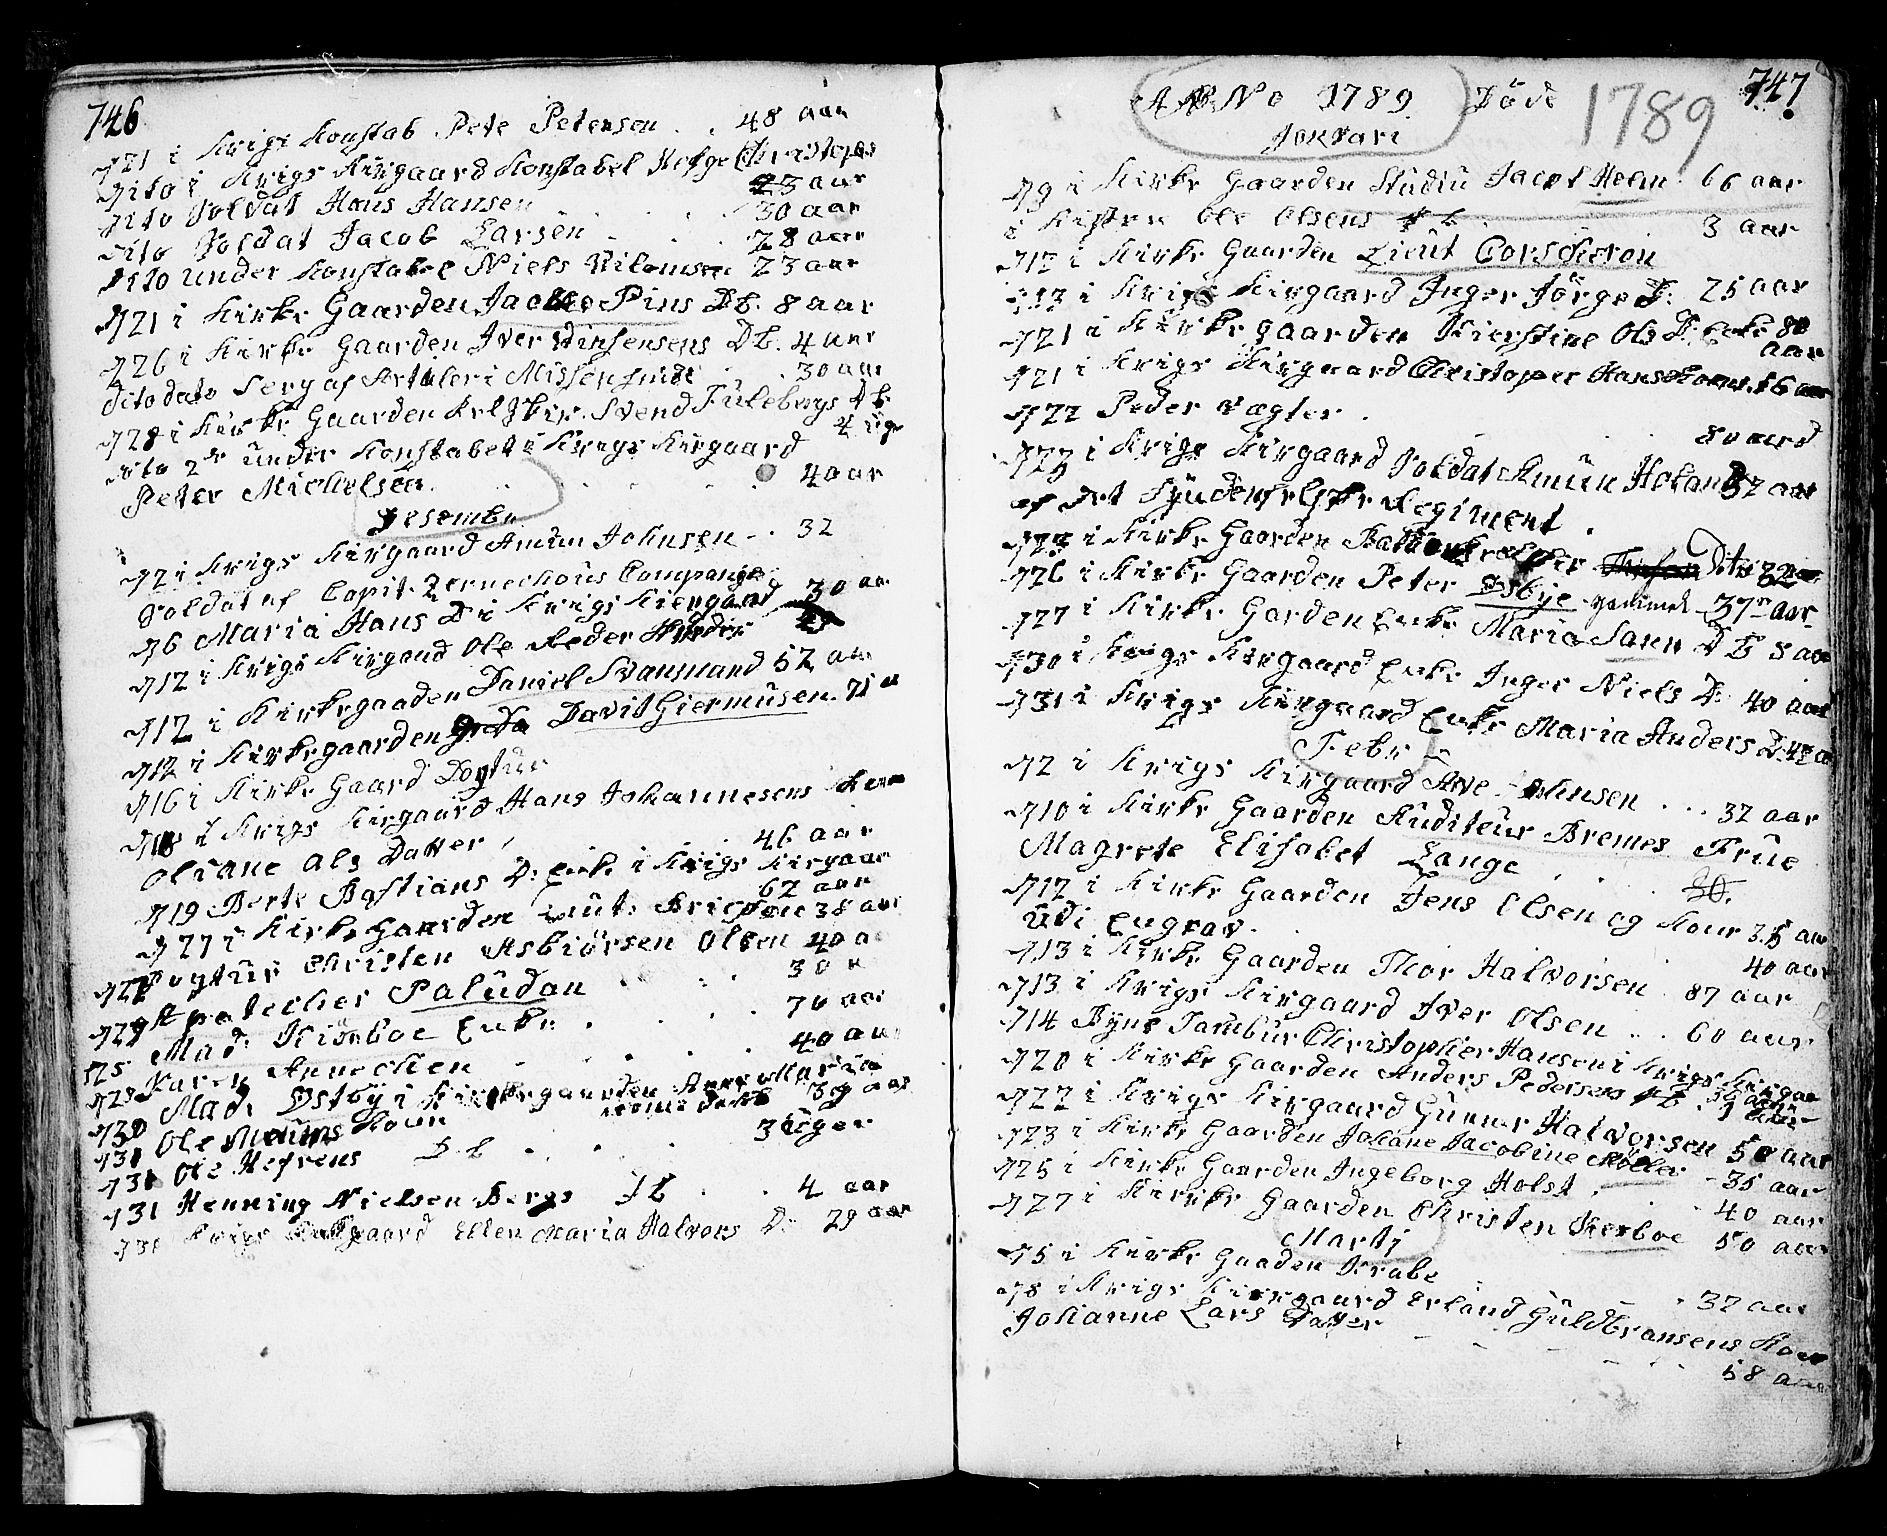 SAO, Fredrikstad prestekontor Kirkebøker, F/Fa/L0002: Ministerialbok nr. 2, 1750-1804, s. 746-747